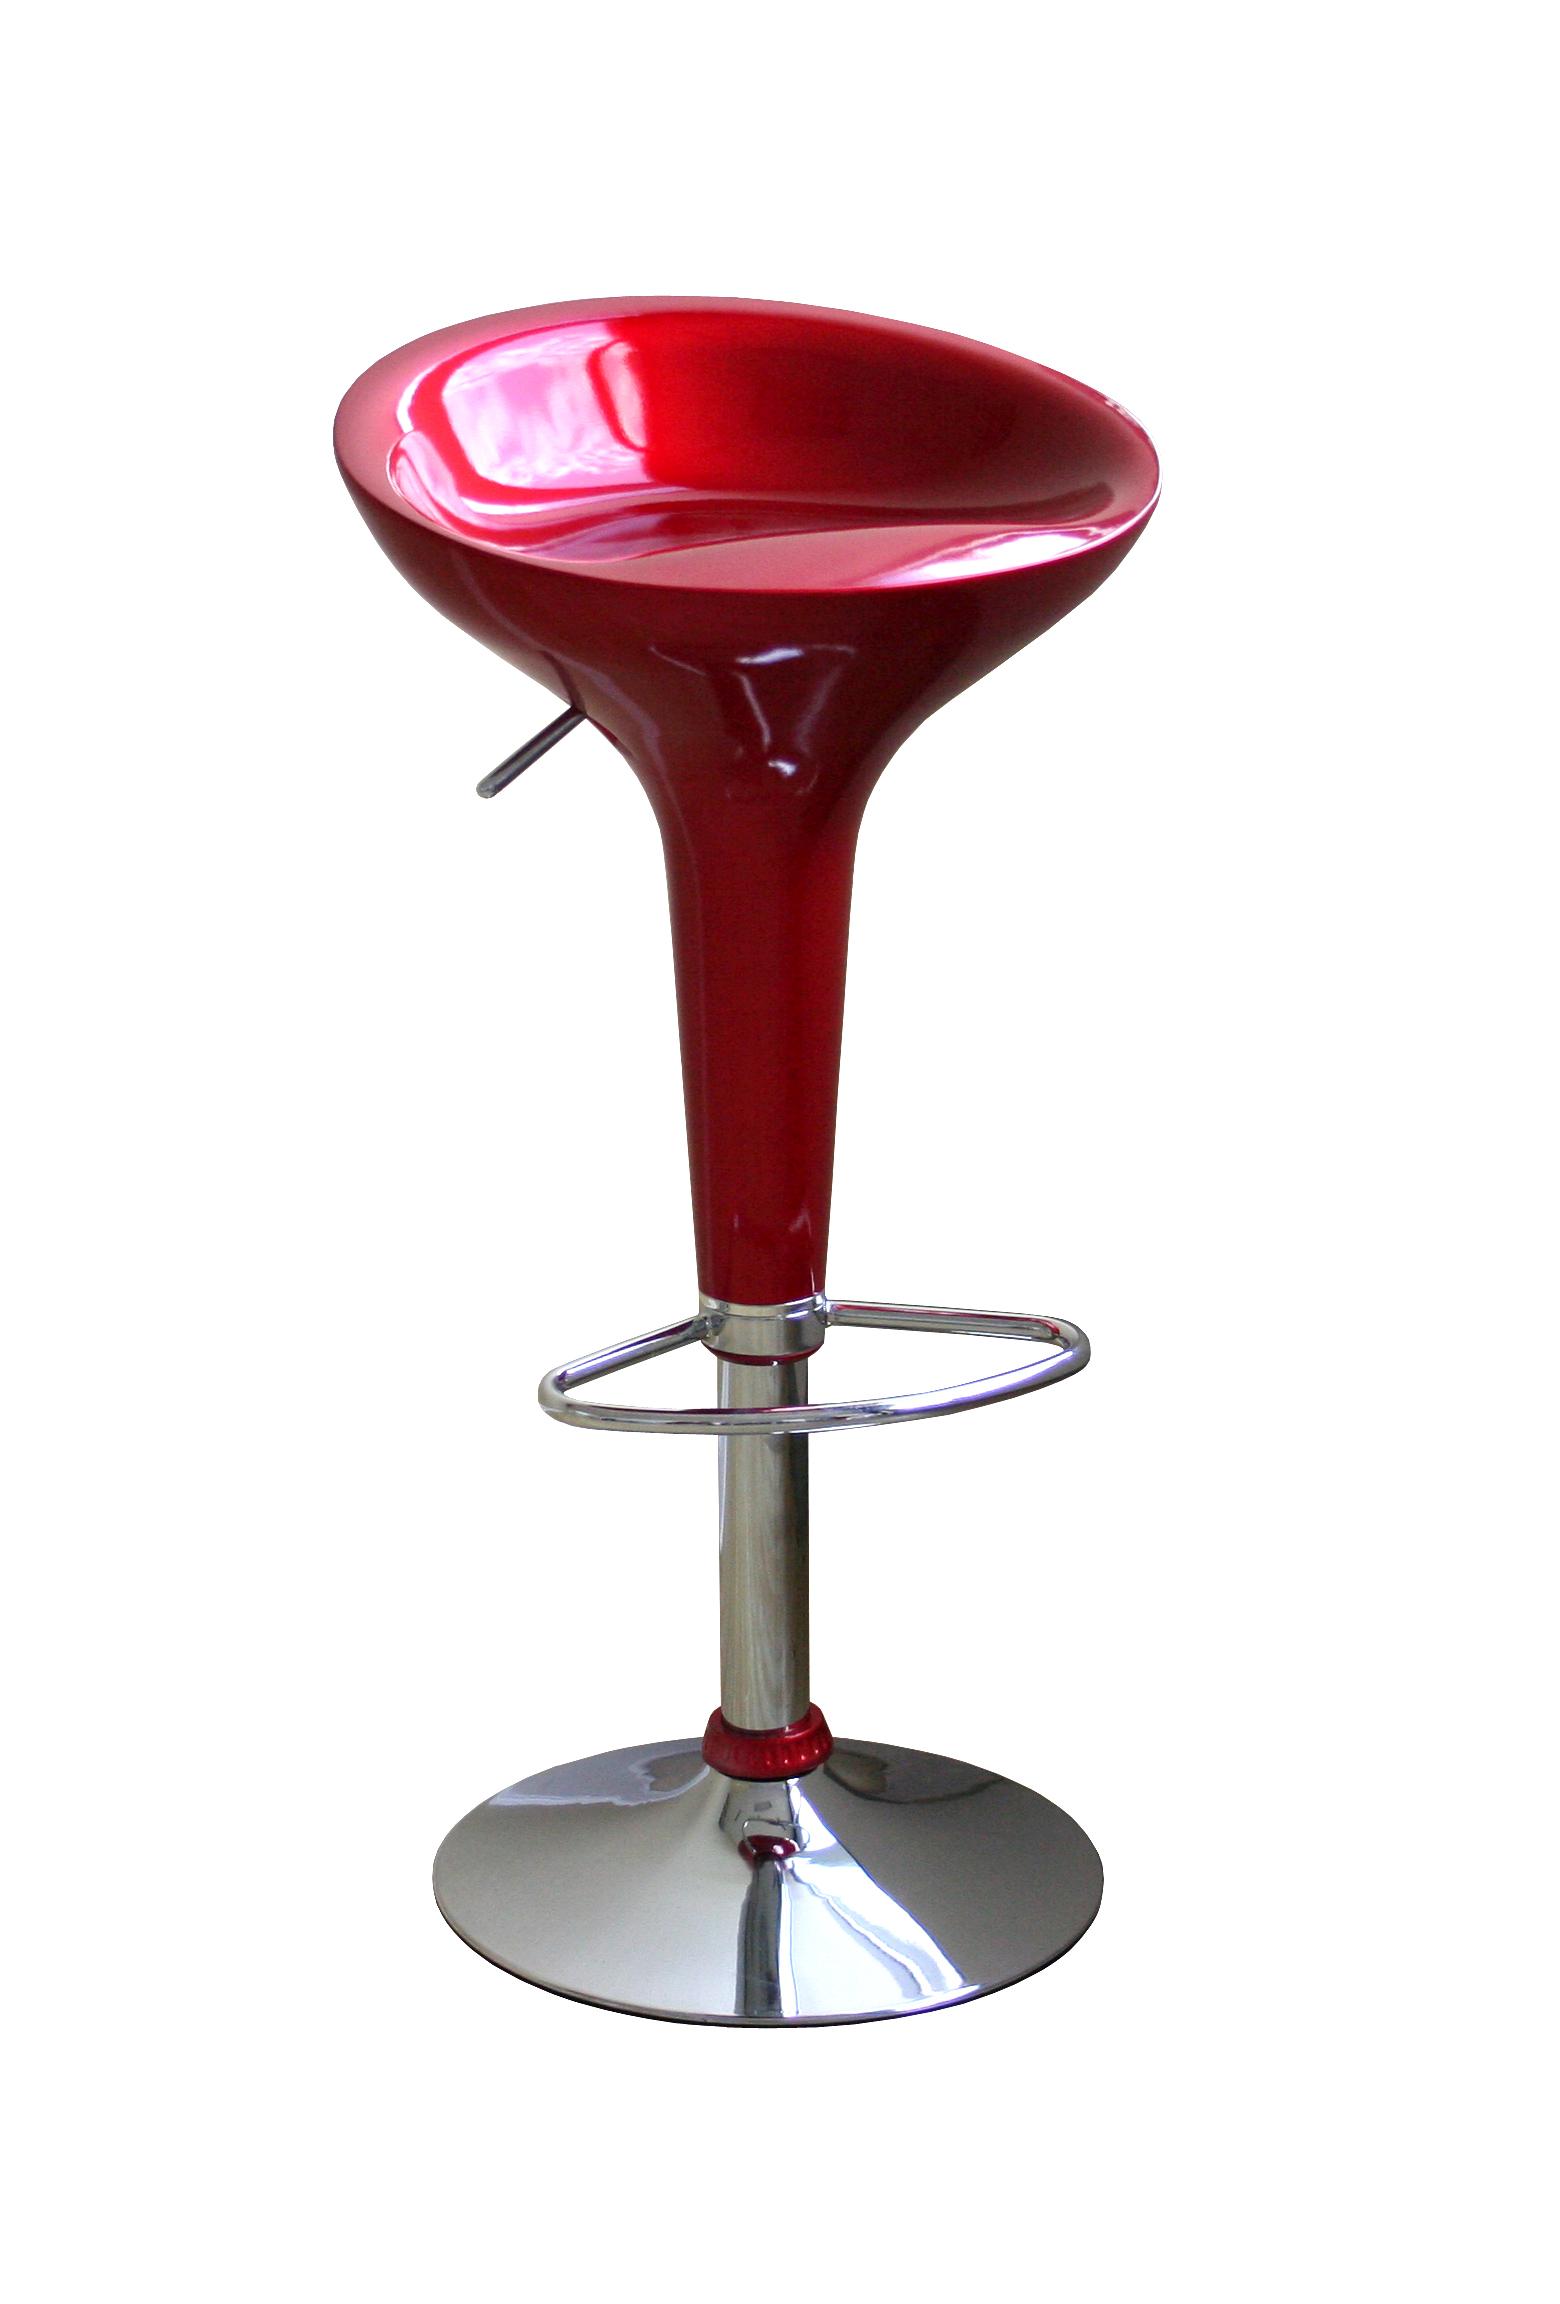 Amazon Lift Chair Modern Red Kitchen Stools – Quicua.com